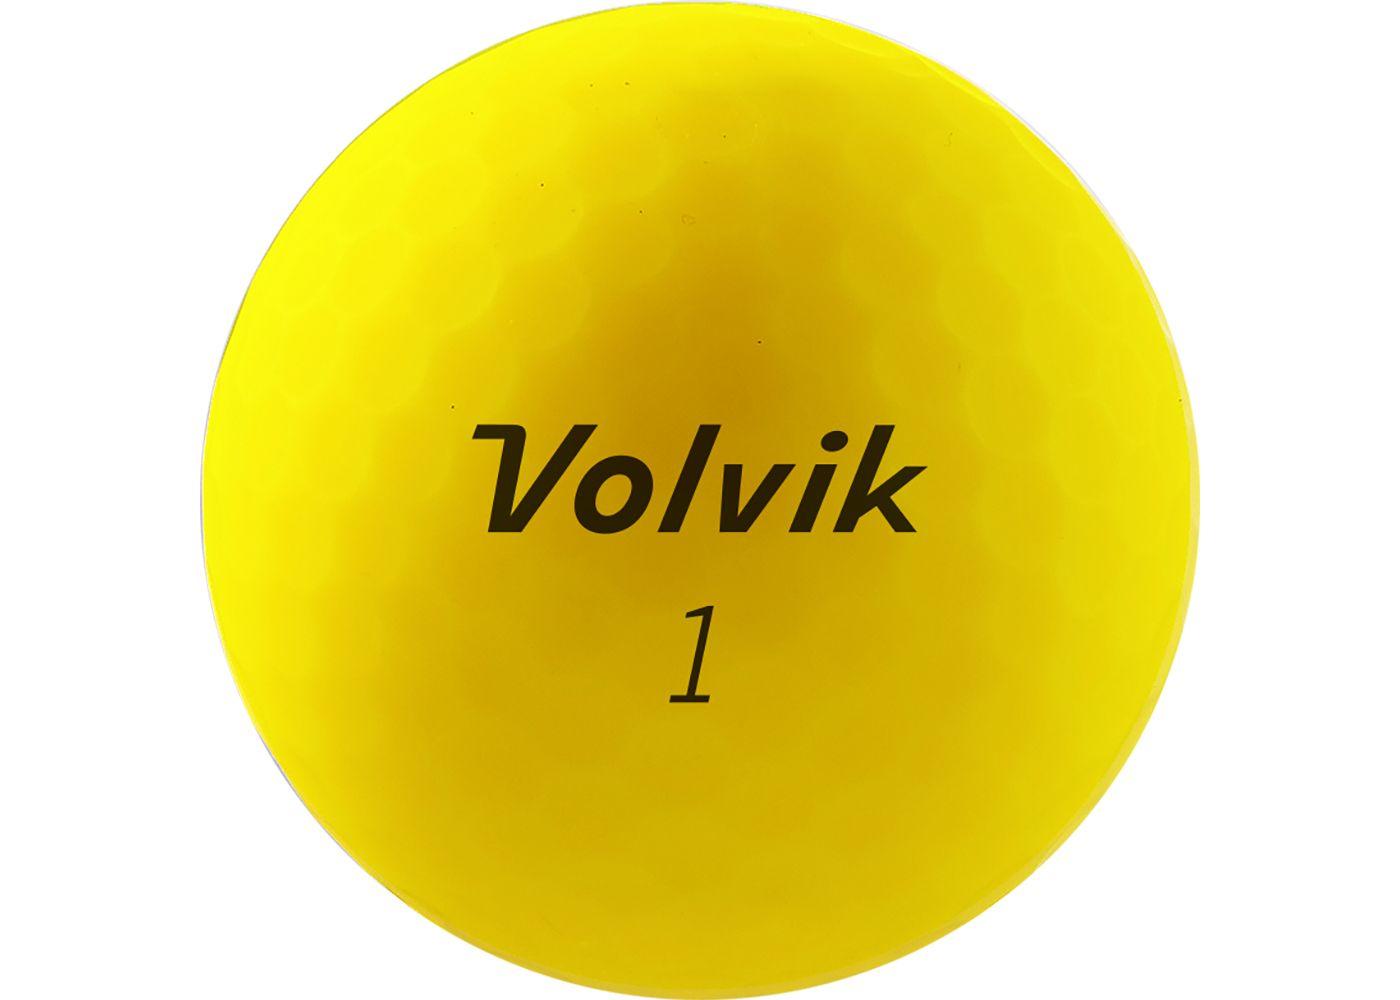 Volvik 2020 VIVID XT AMT Matte Yellow Golf Balls